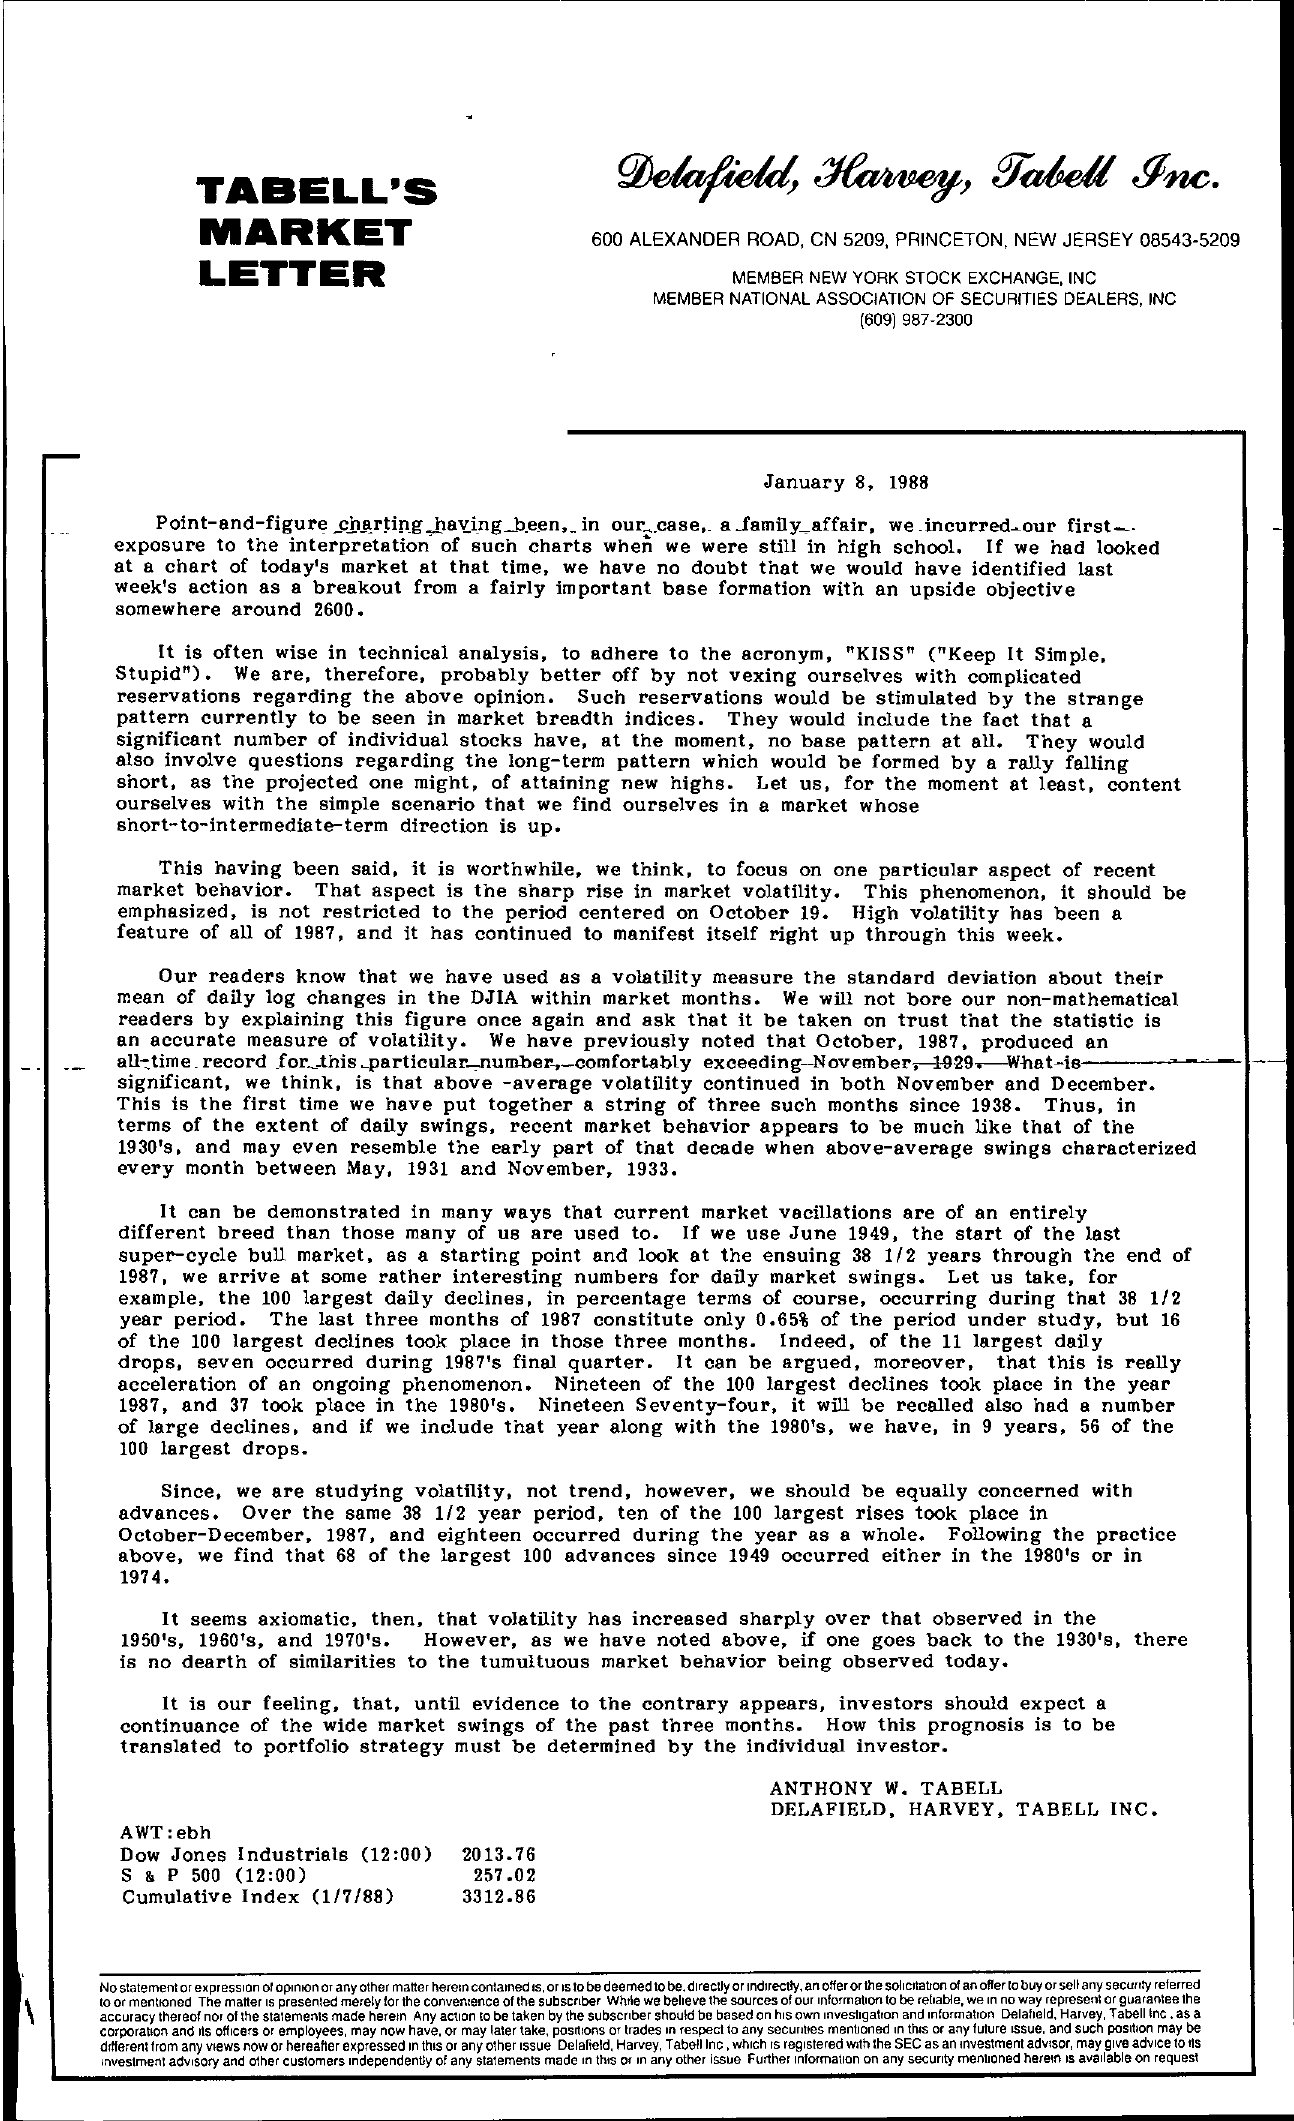 Tabell's Market Letter - January 08, 1988